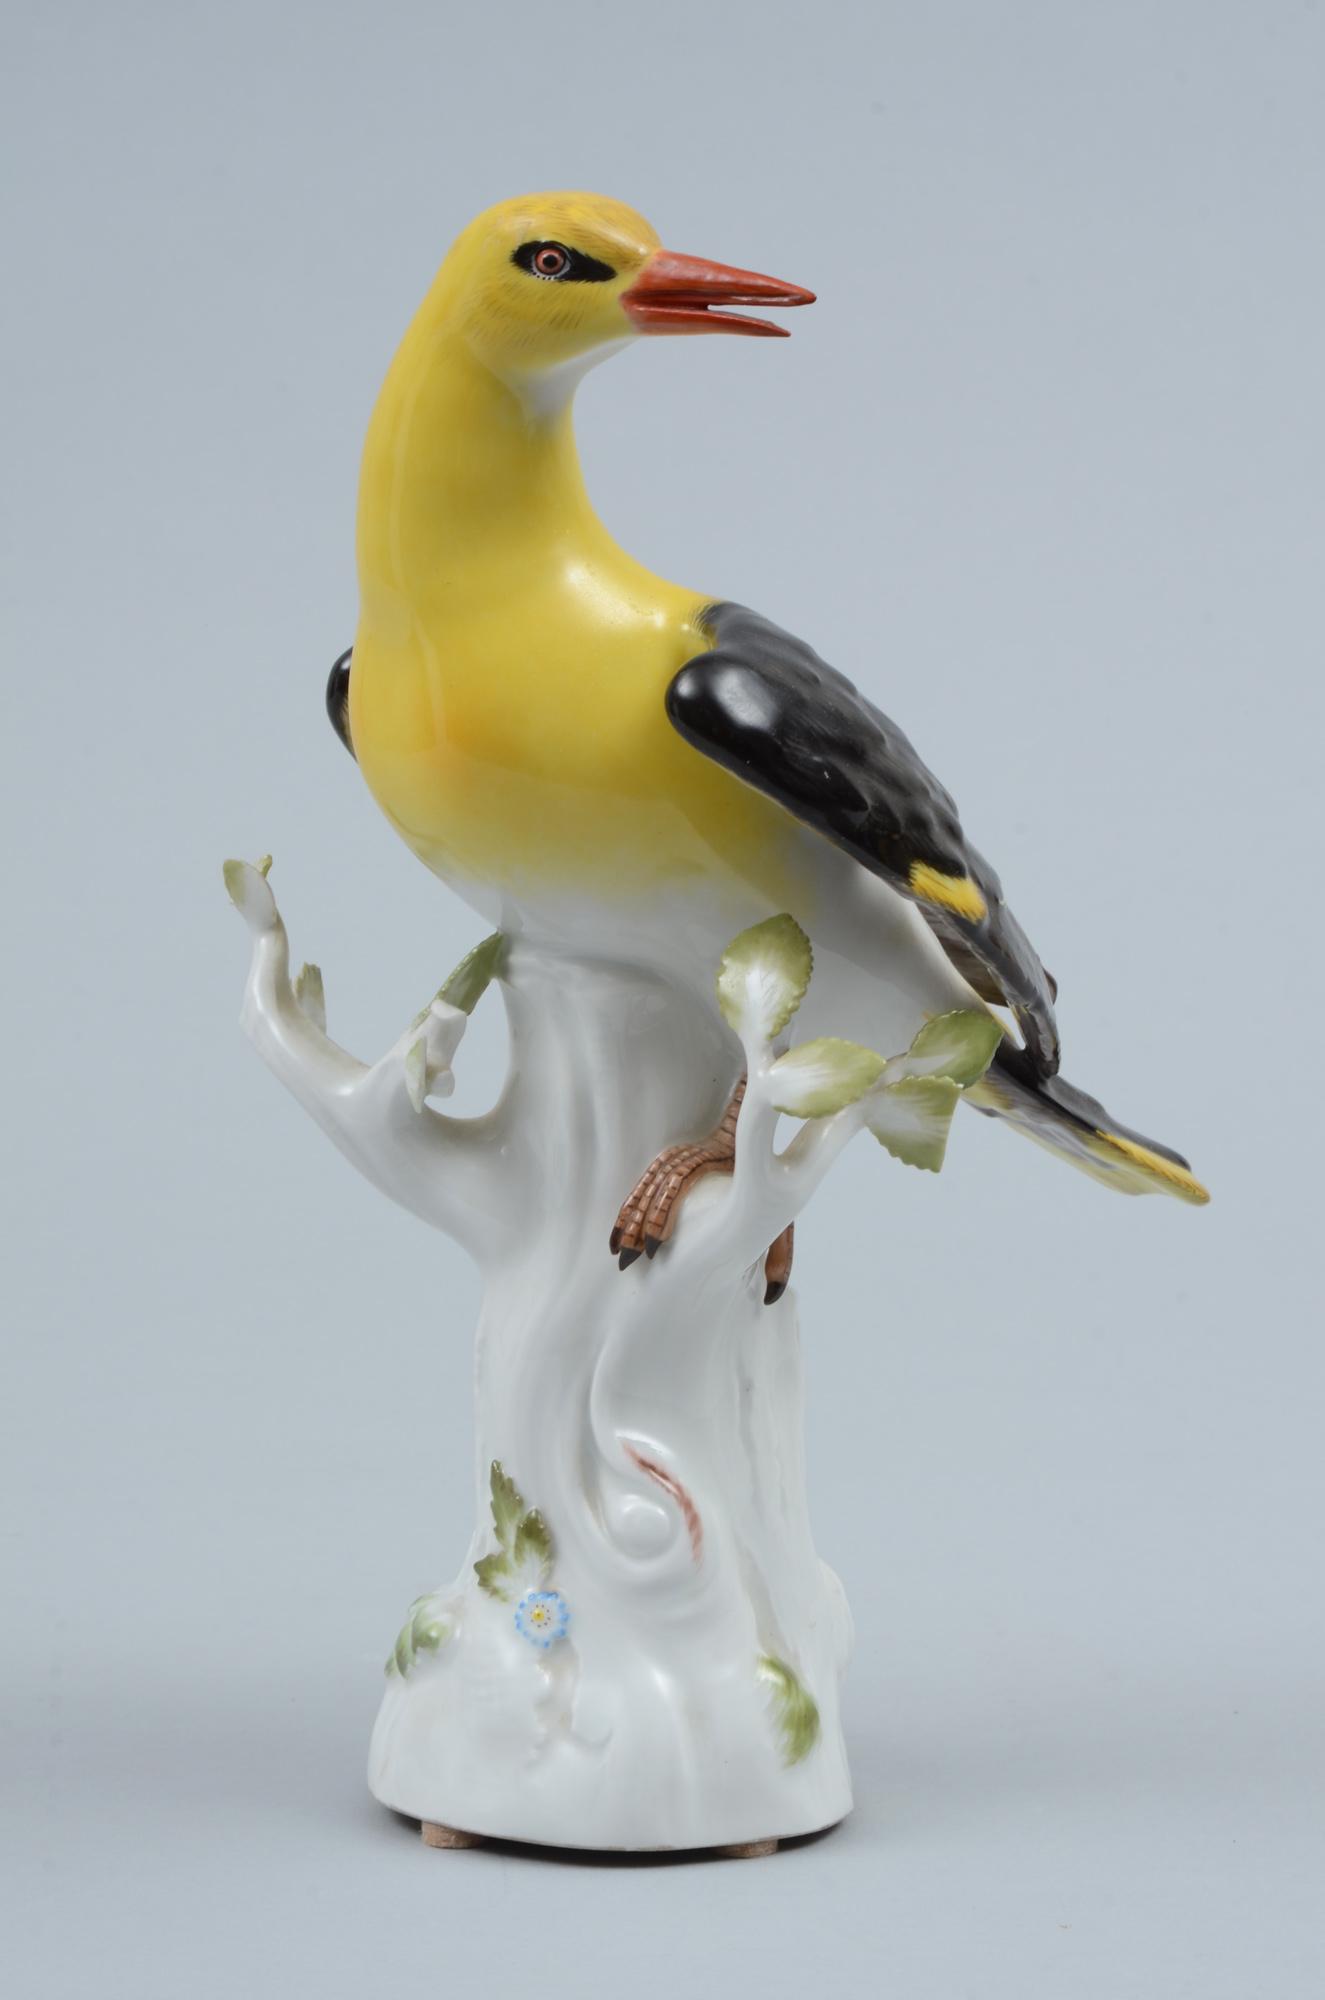 187 Product 187 Meissen Porcelain Bird